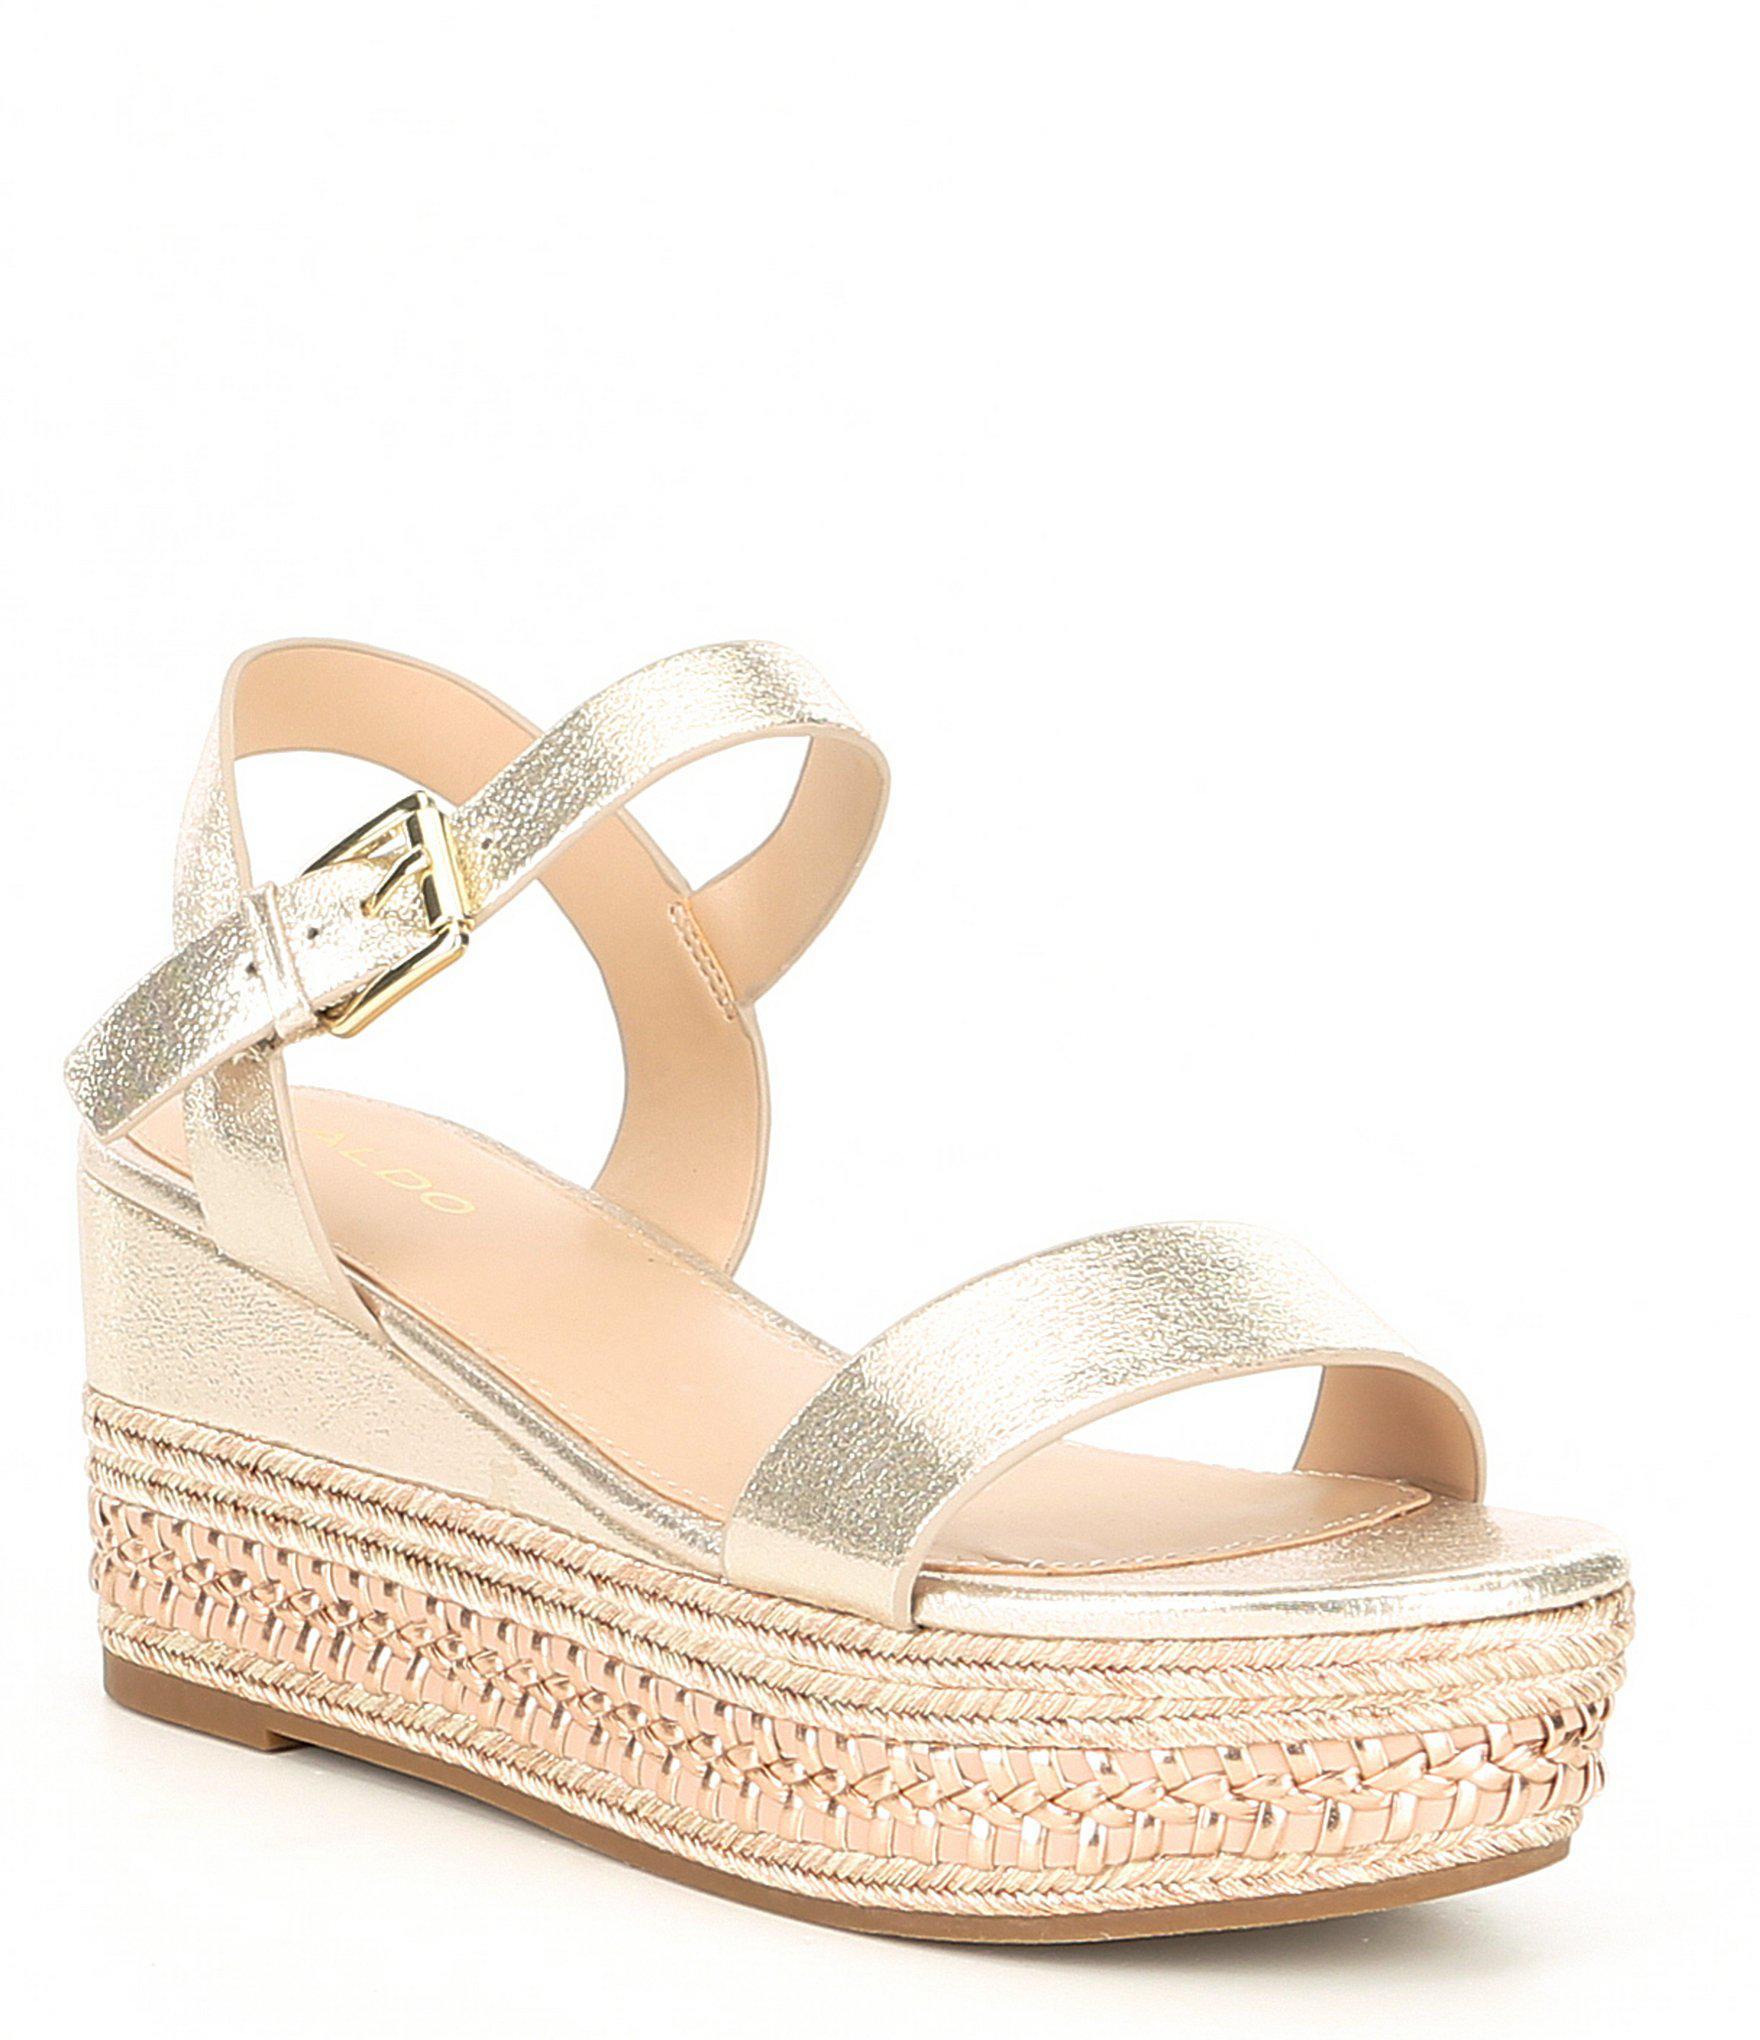 8f3964ee4e38 Lyst - ALDO Mauma Espadrille Sandals in Metallic